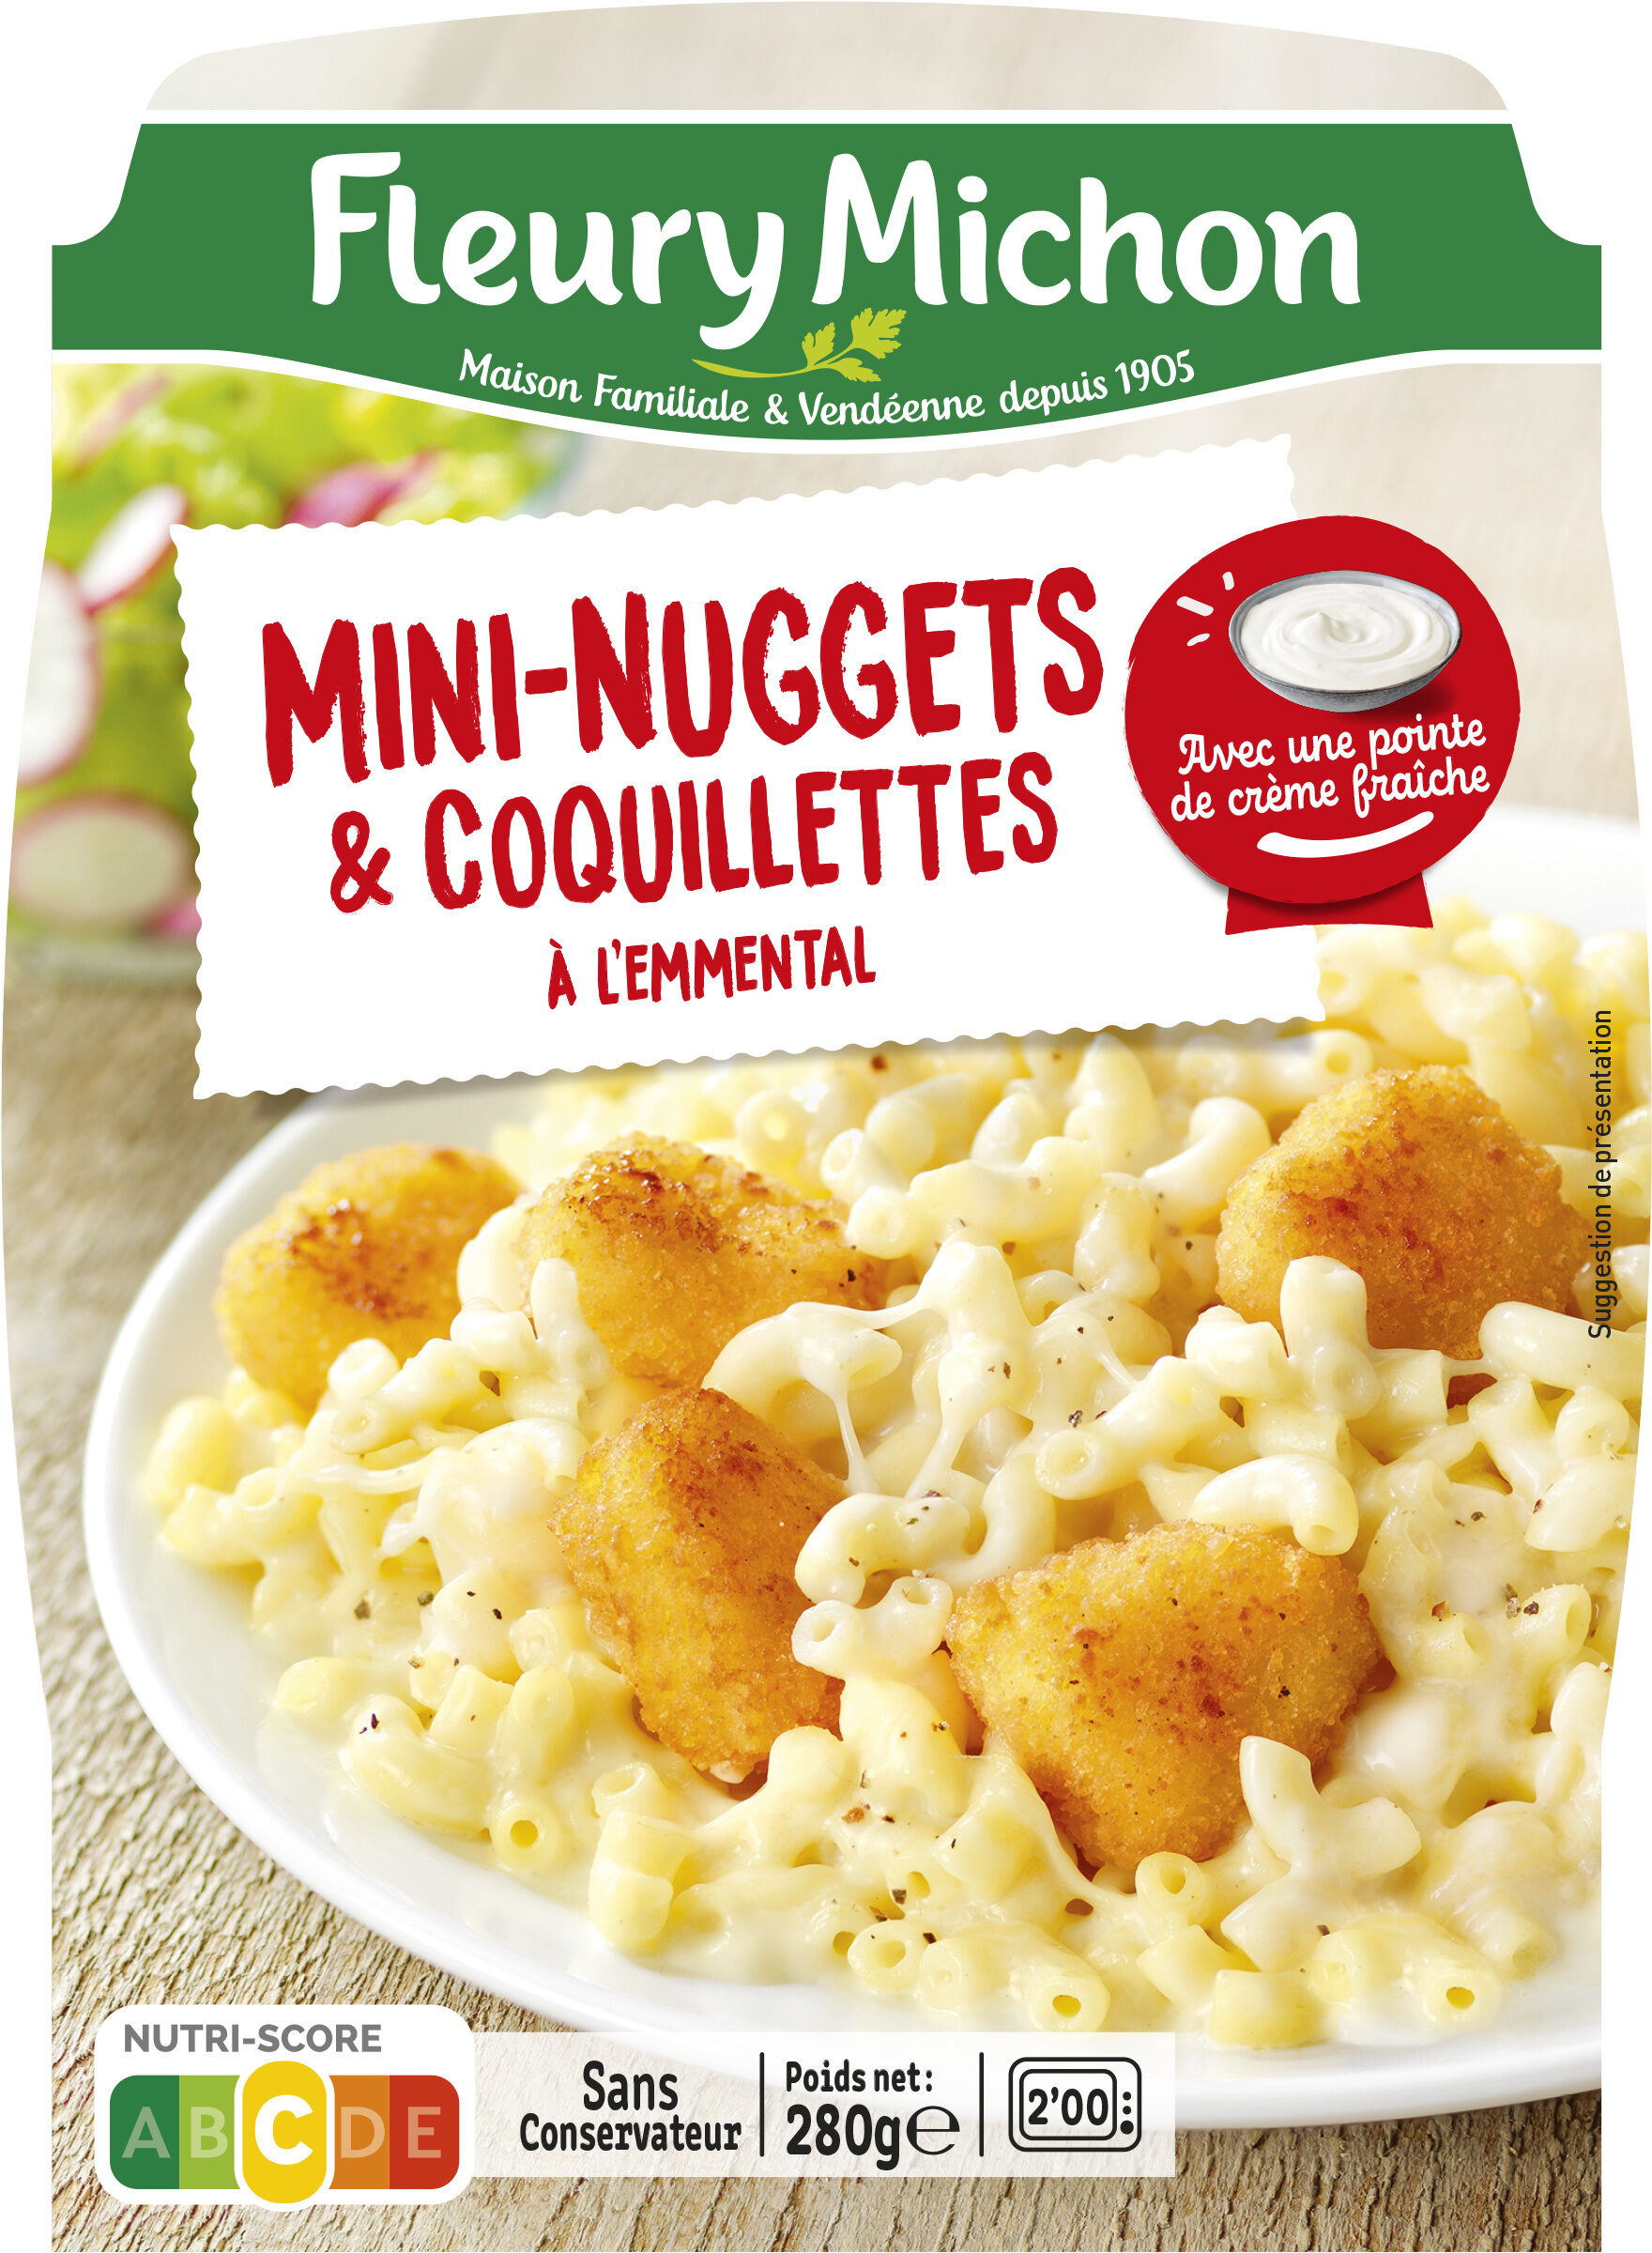 Mini nuggets & coquillettes à l'emmental - Product - fr